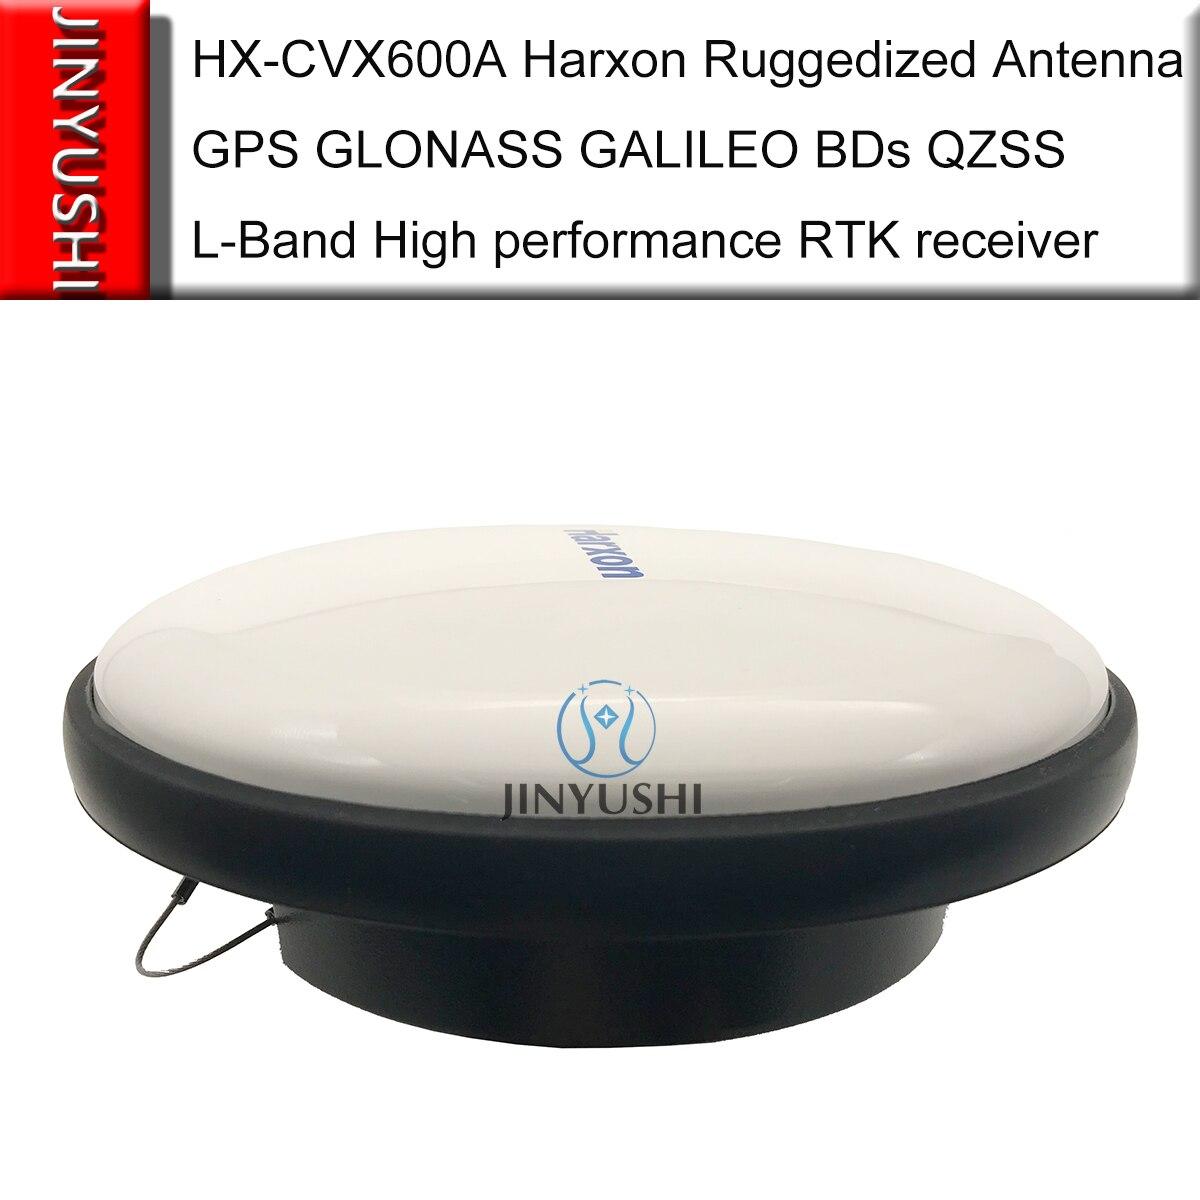 HX-CVX600A هاركسون هوائي قوي لتحديد المواقع L1 L2 L5 غلوناس غاليليو BDs QZSS L-الفرقة عالية الأداء GNSS مسح RTK المتلقي